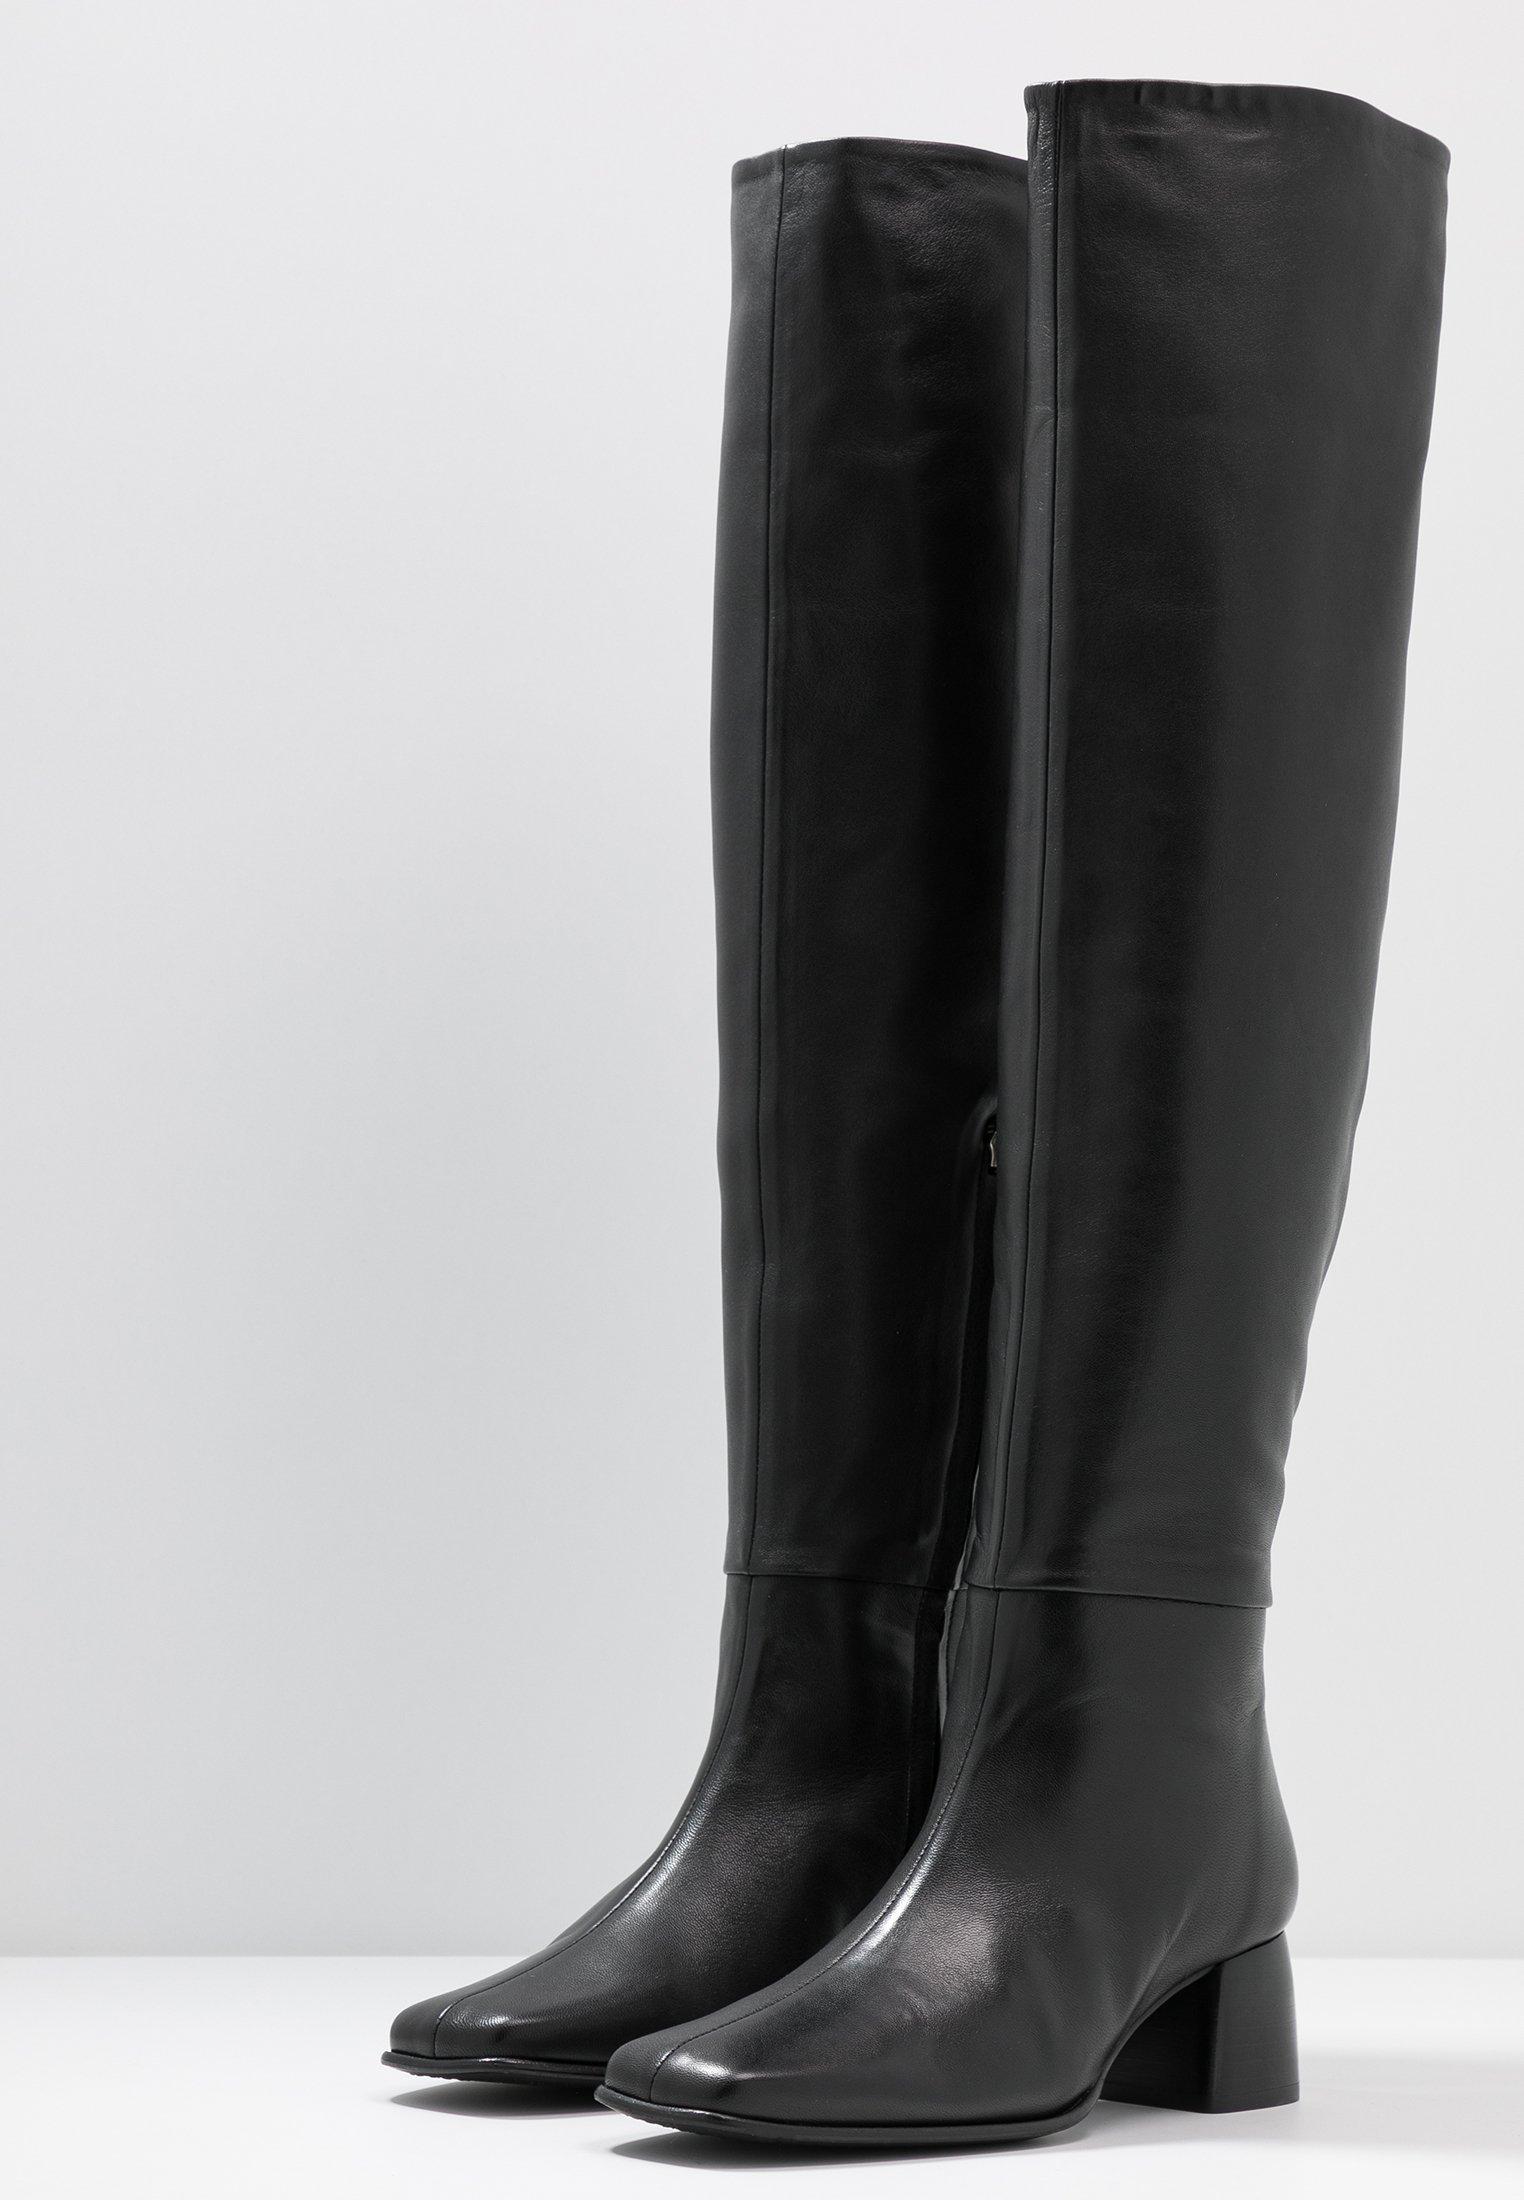 K CAMILLE HIGH Filippa BOOTCuissardes black 7gbyIYf6vm